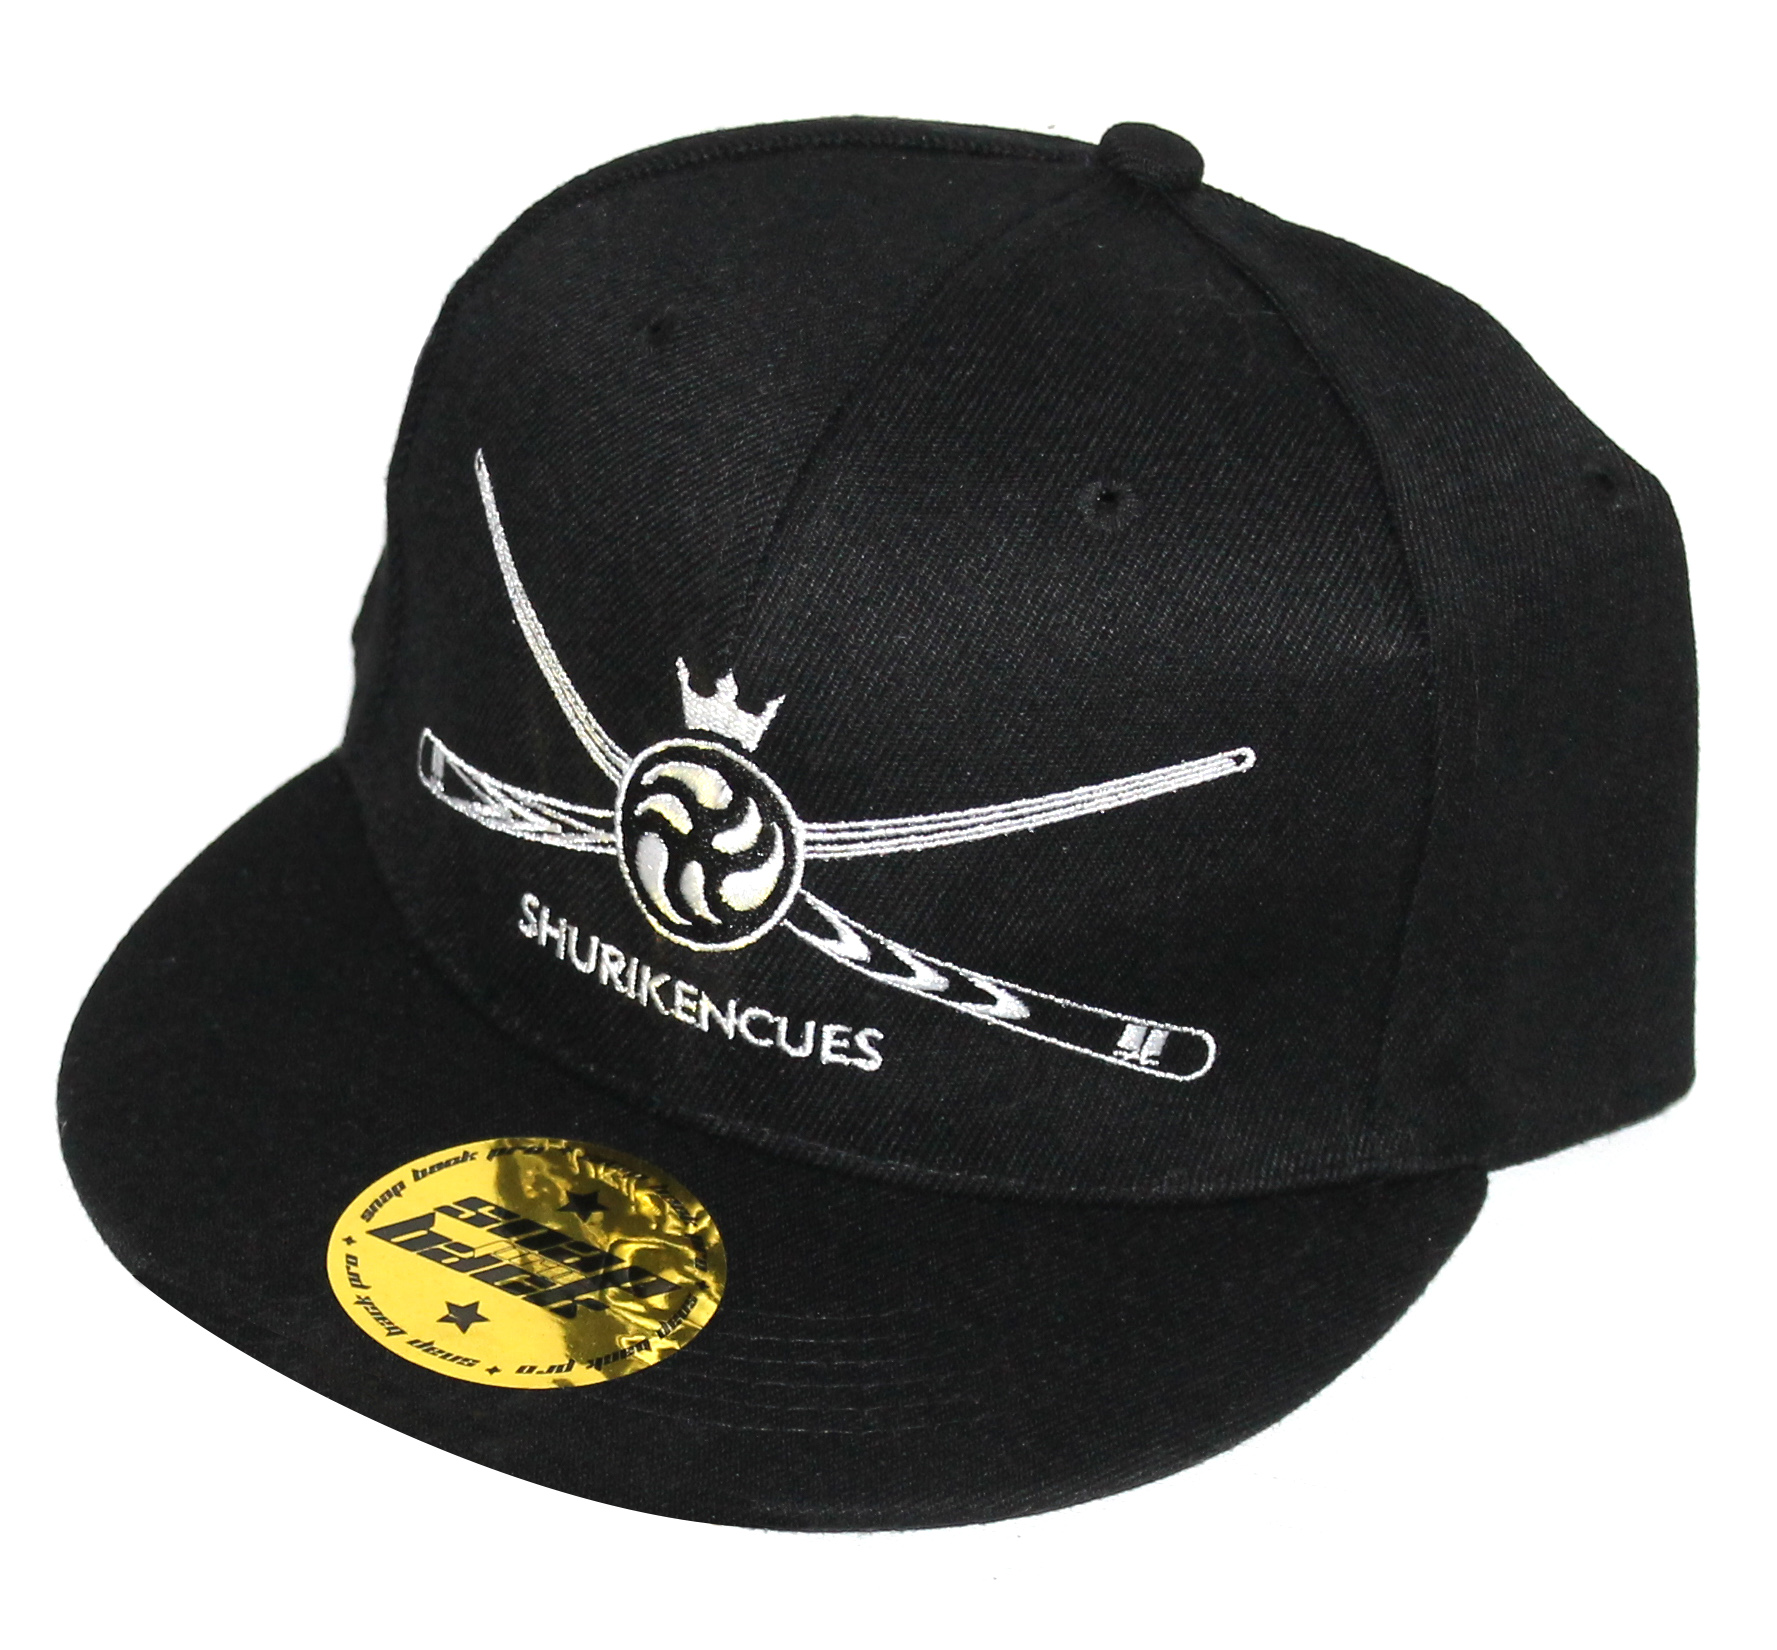 firm snapback shurikencues hat cap snap back